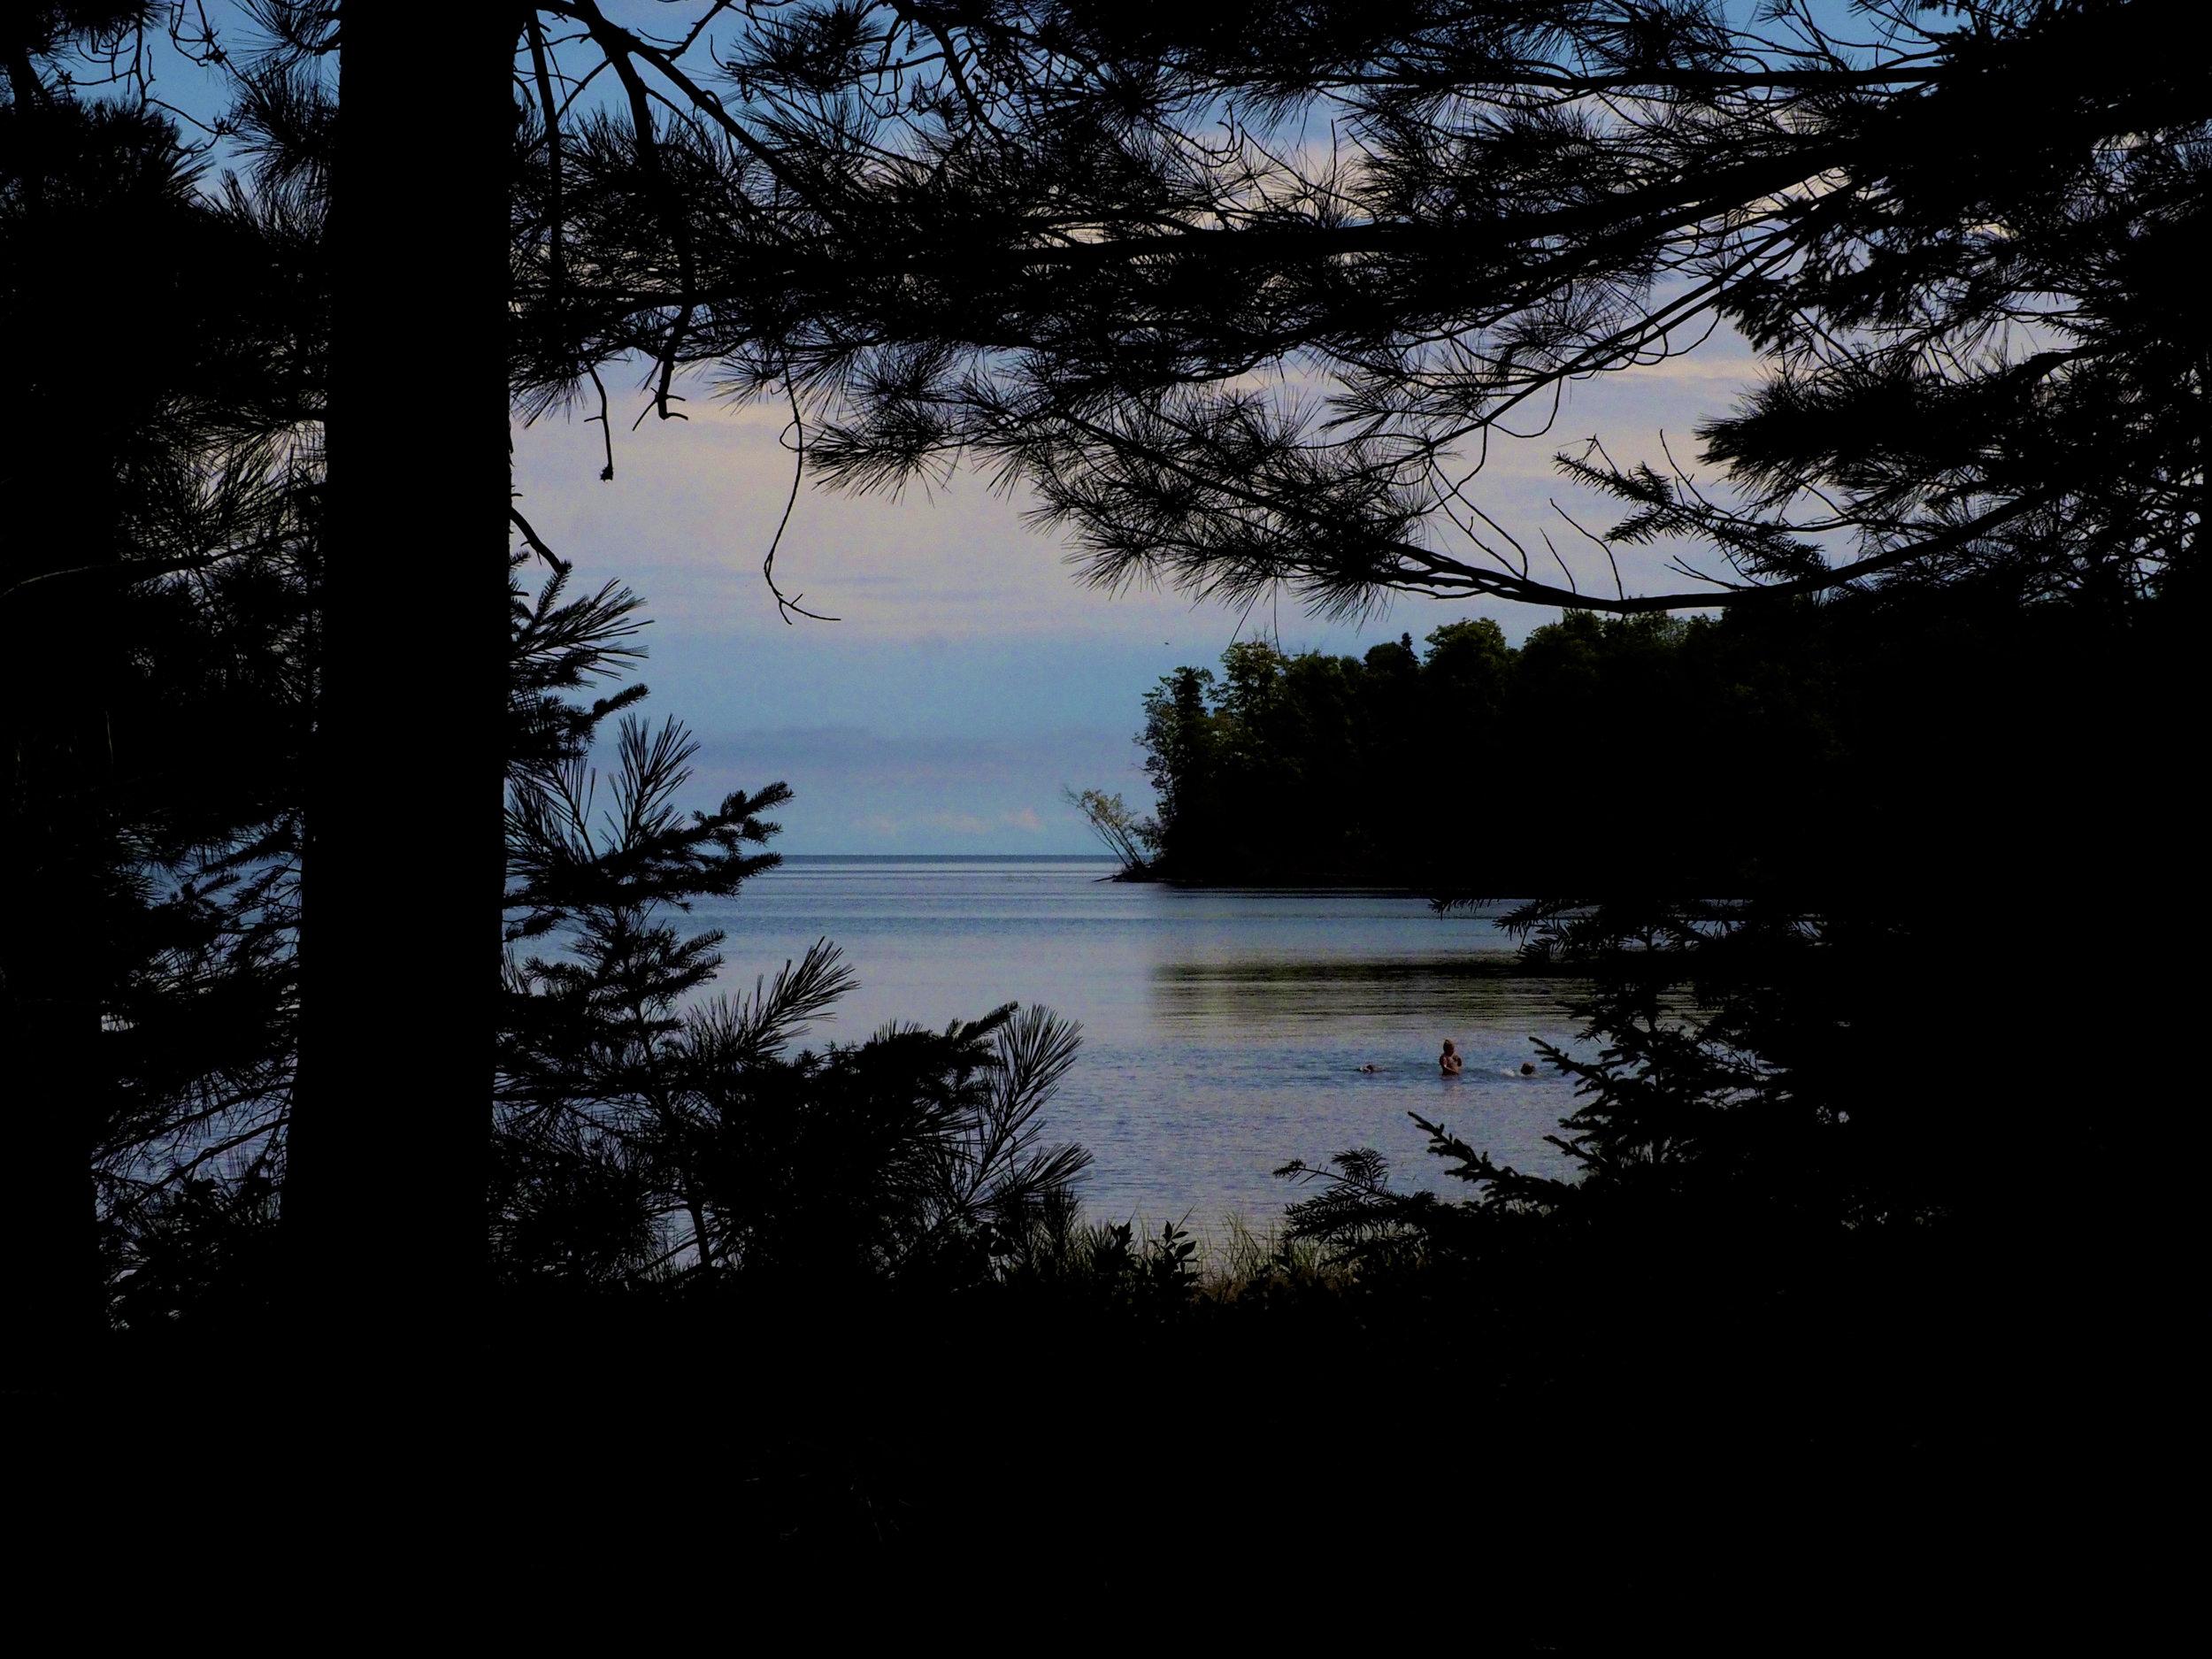 cindi_Madeline_NationalForest_Bog_spiritedtable_photo04.jpg